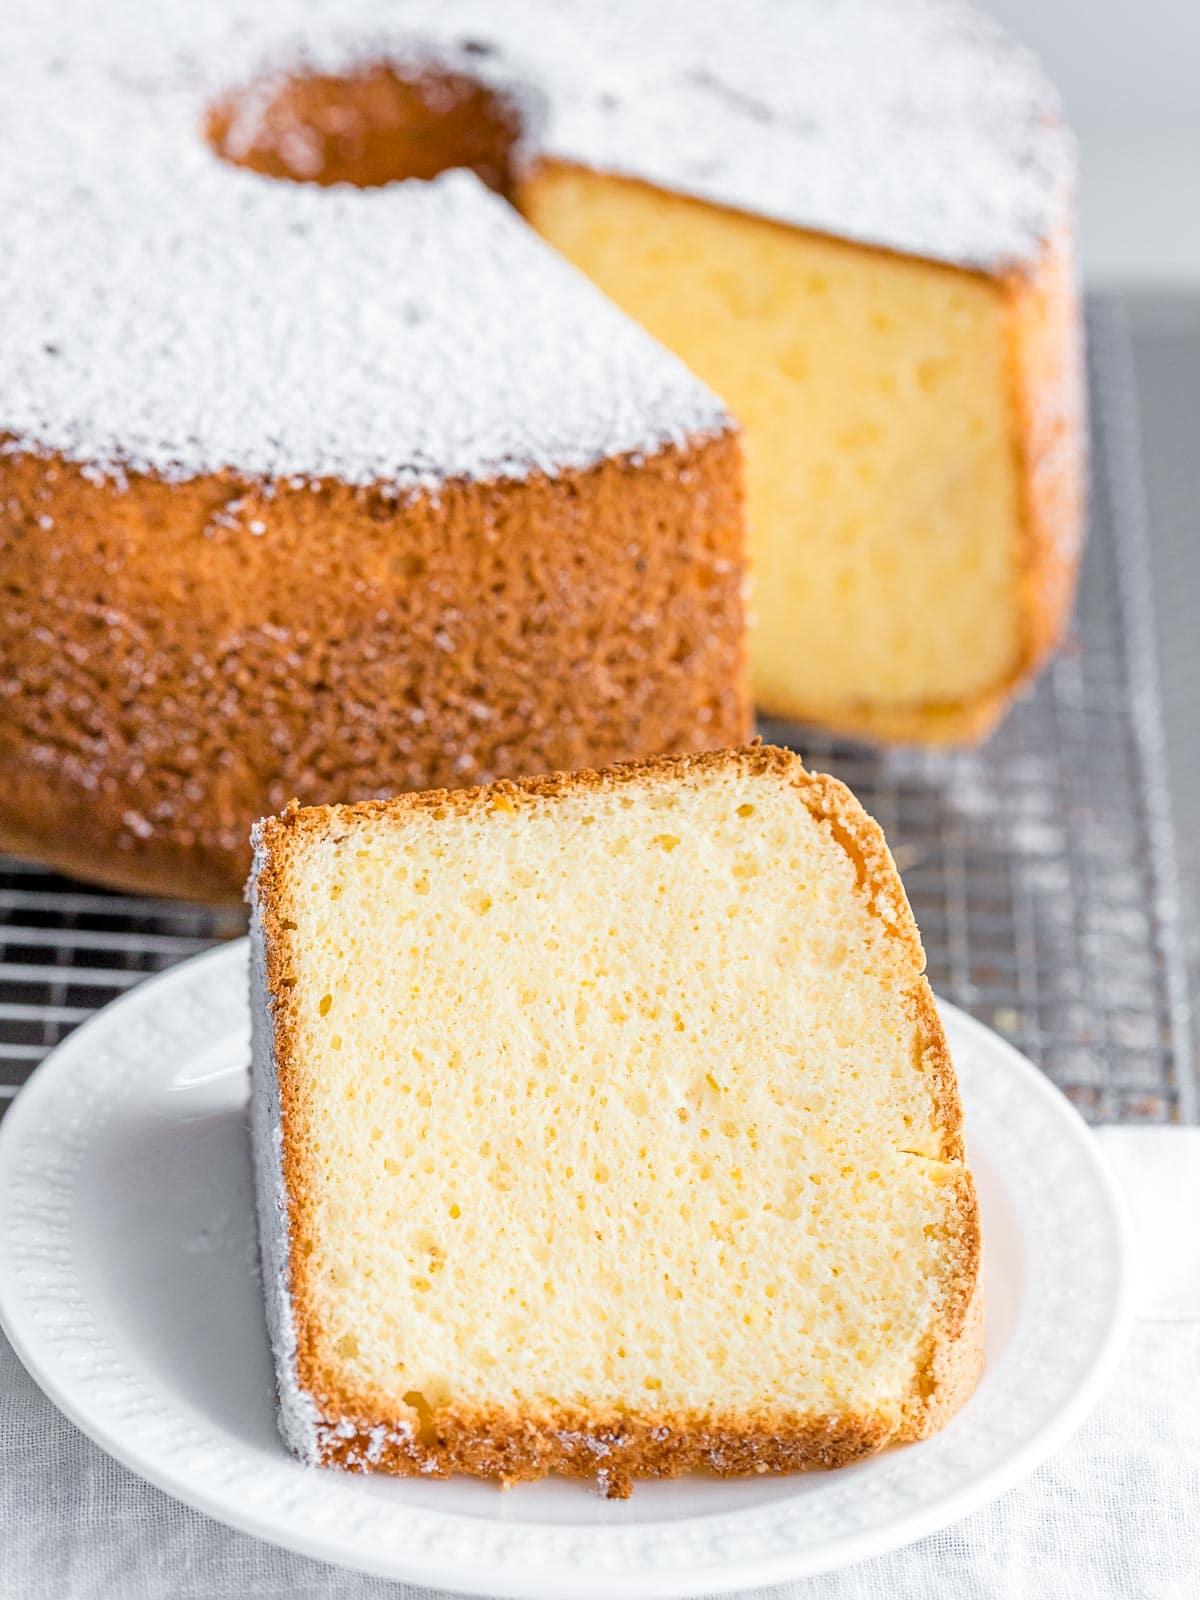 a slice of fluffy vanilla chiffon cake